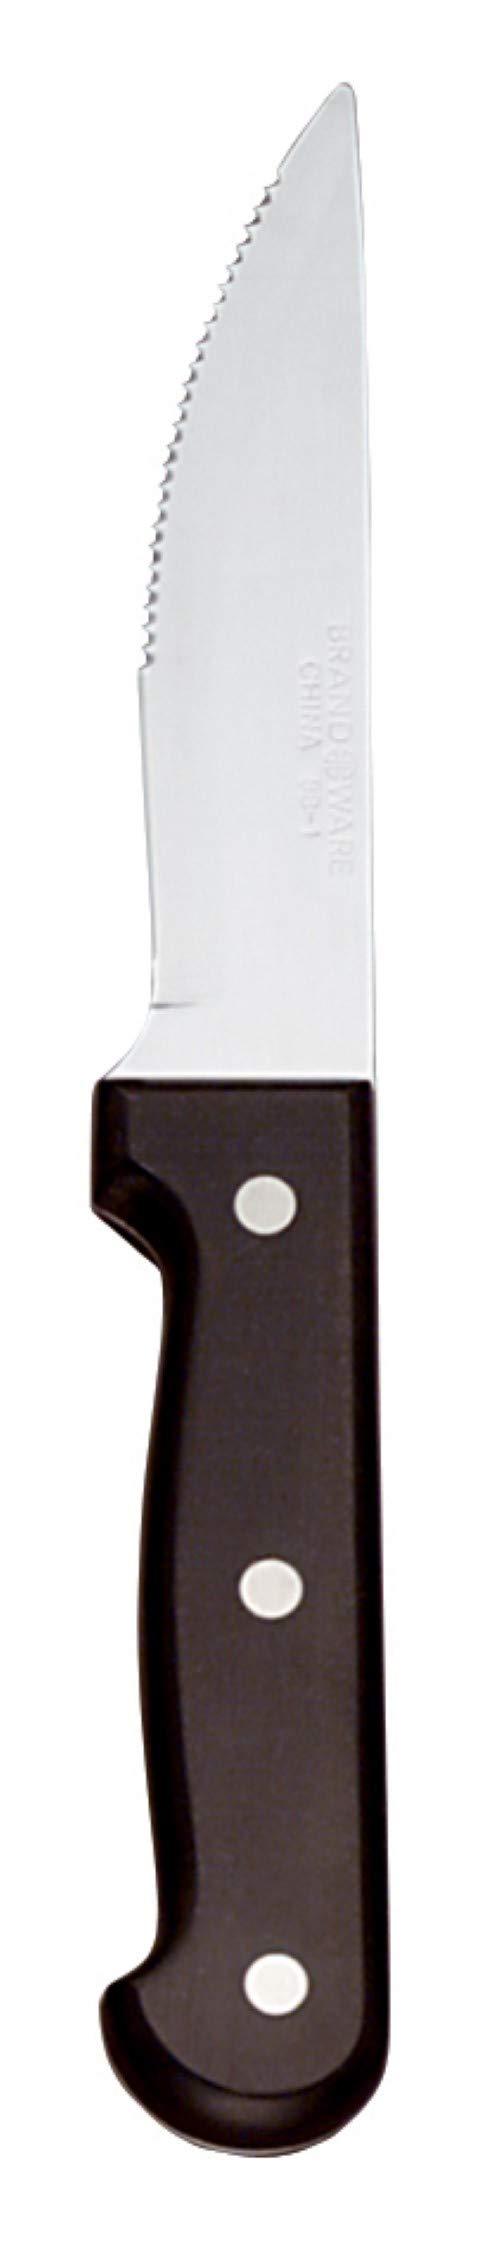 World Tableware Chop House Steak Knife, 8 3/4 inch - 12 per case